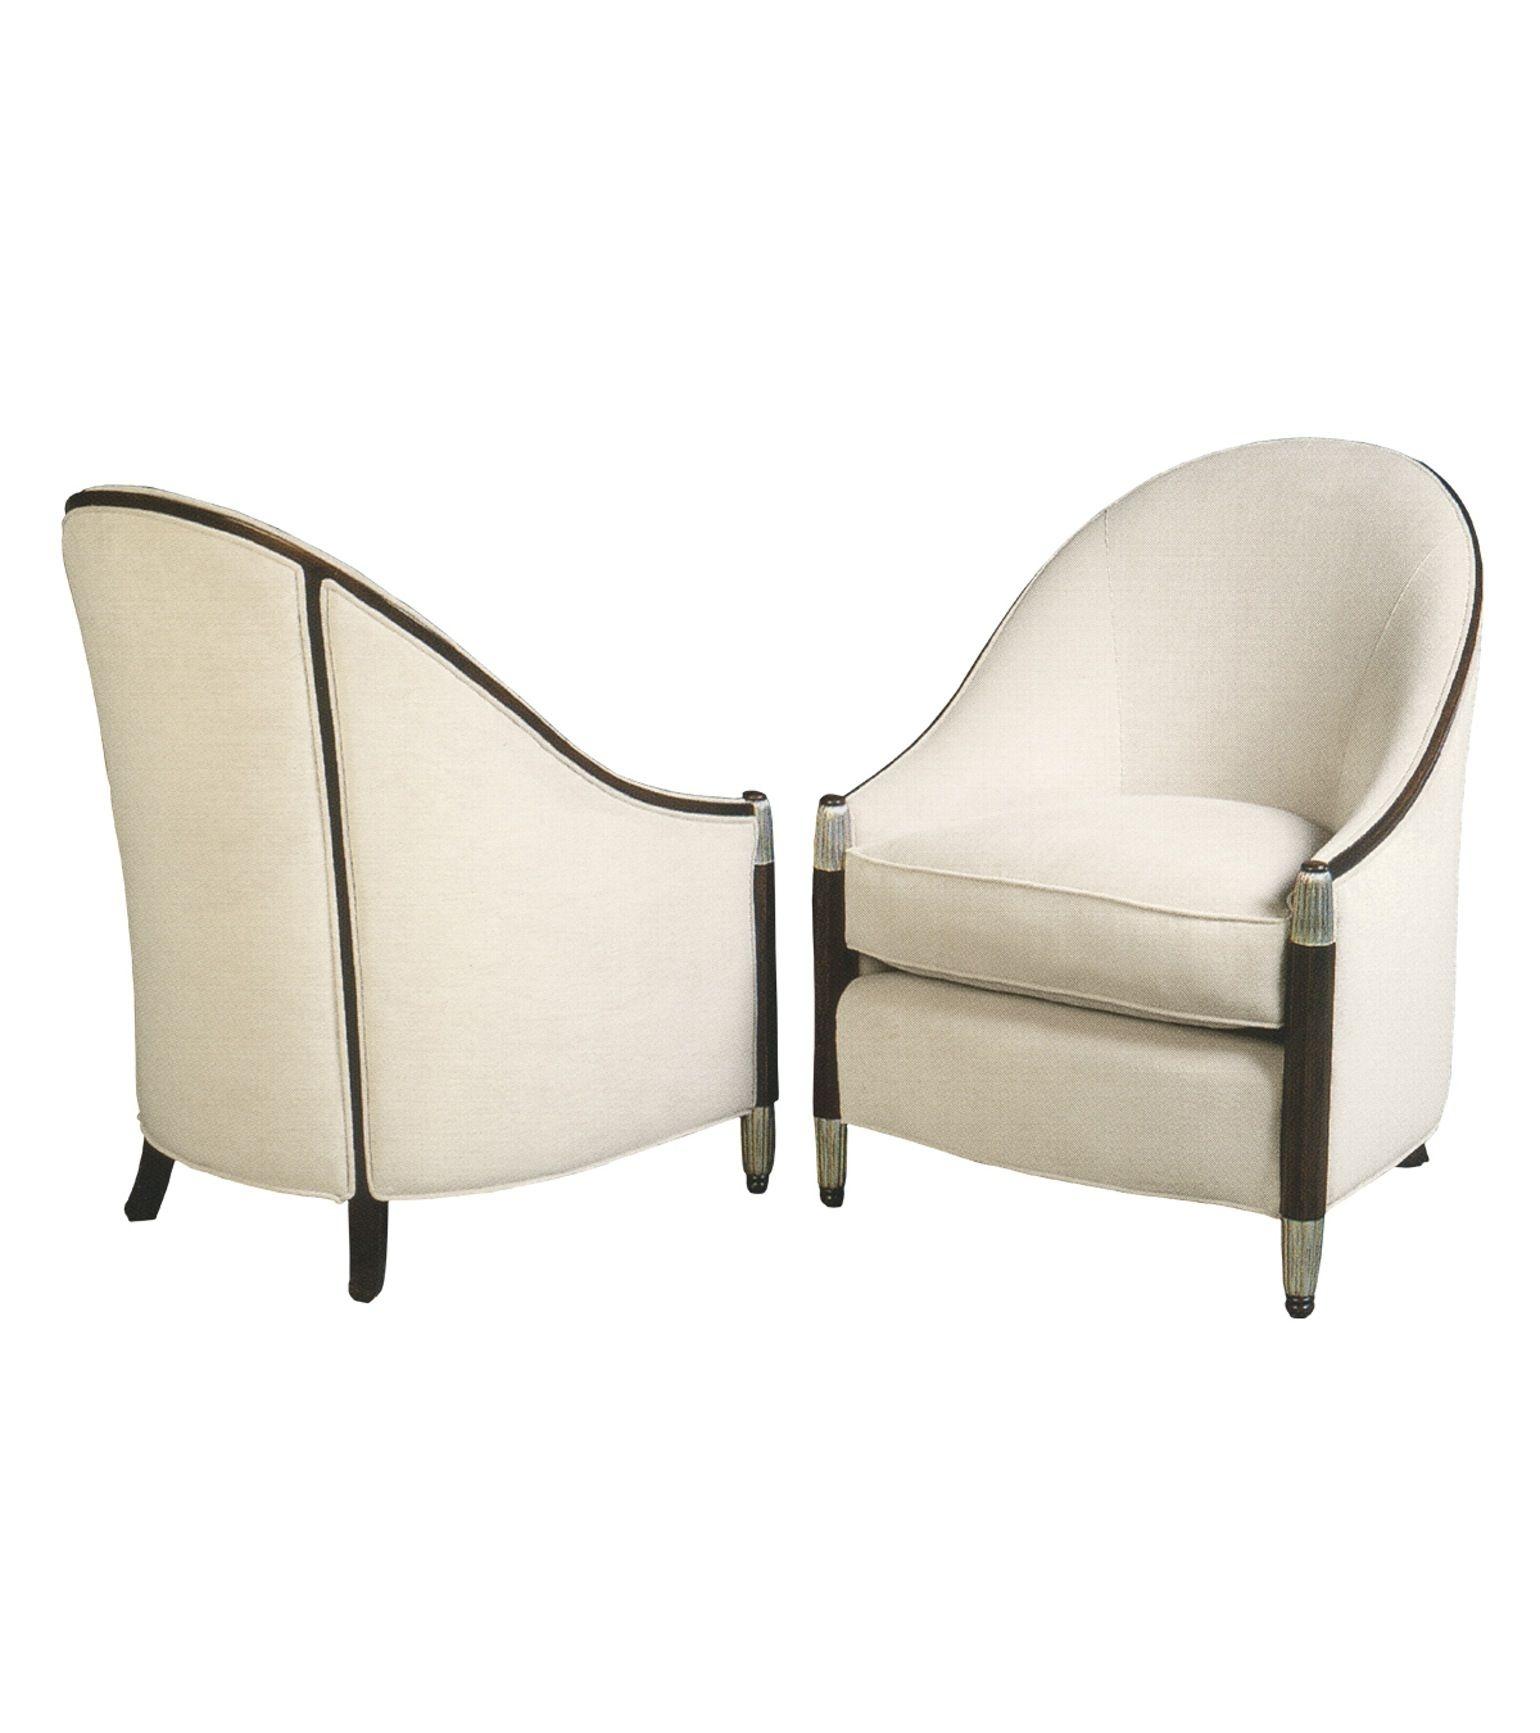 Genial Art Deco Lounge Chair